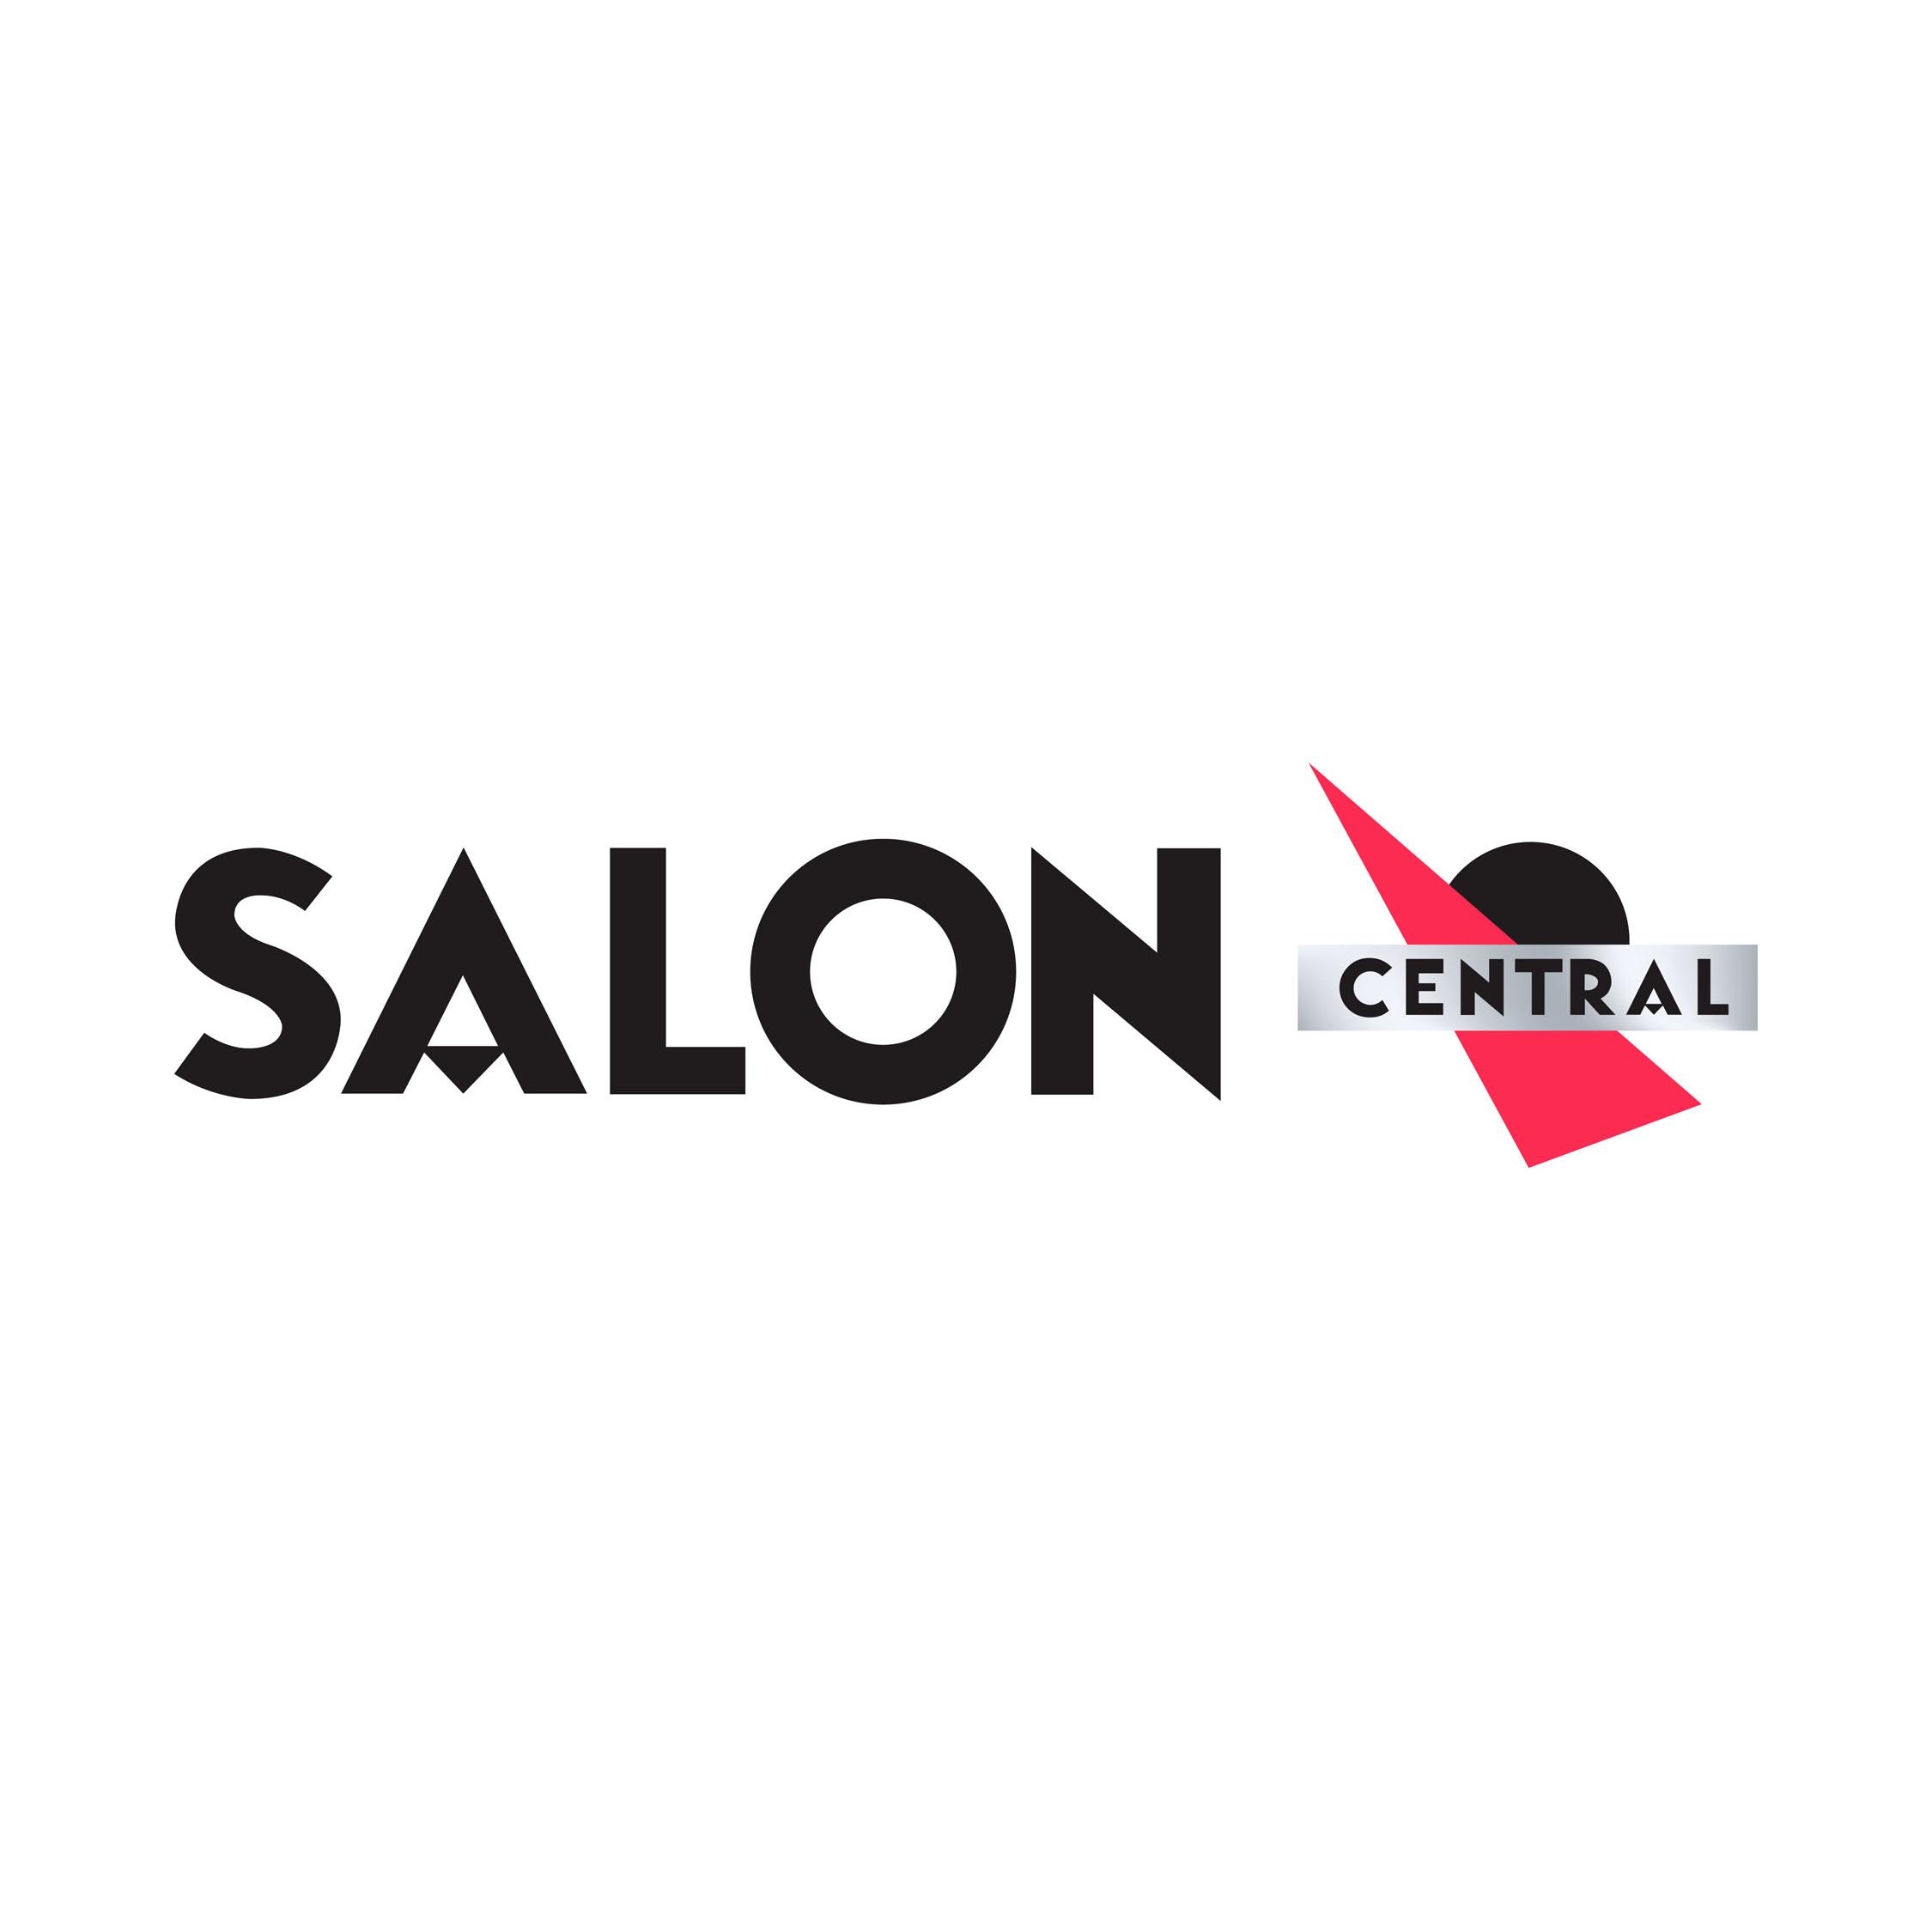 Salon Central